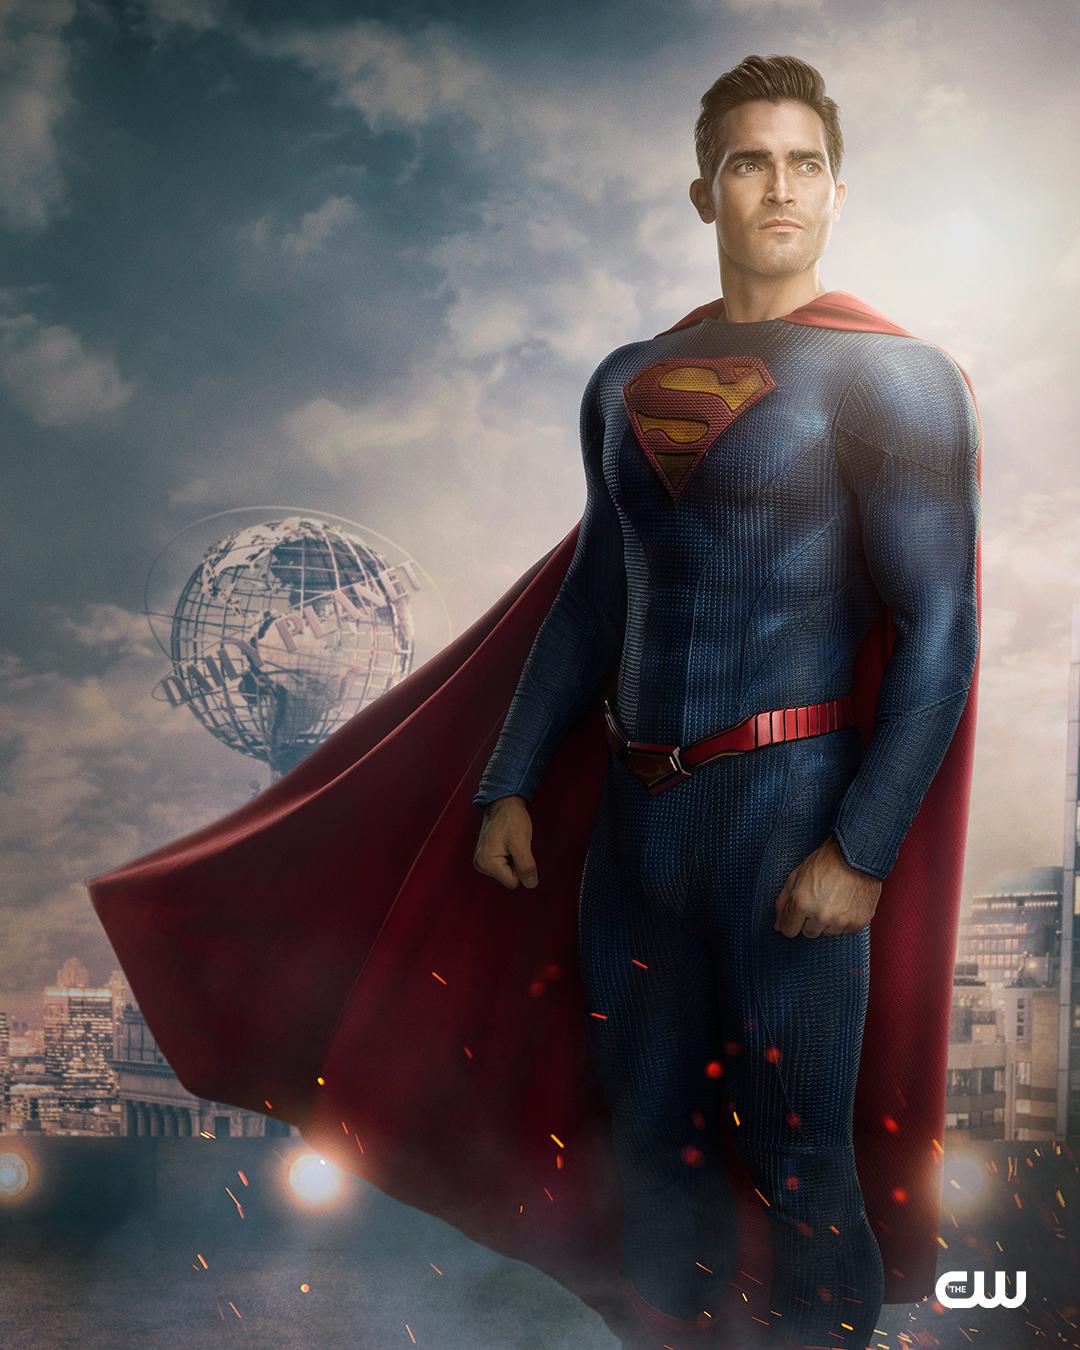 Superman (Tyler Hoechlin) en Superman & Lois. Imagen: Superman and Lois Twitter (@cwsupermanlois).